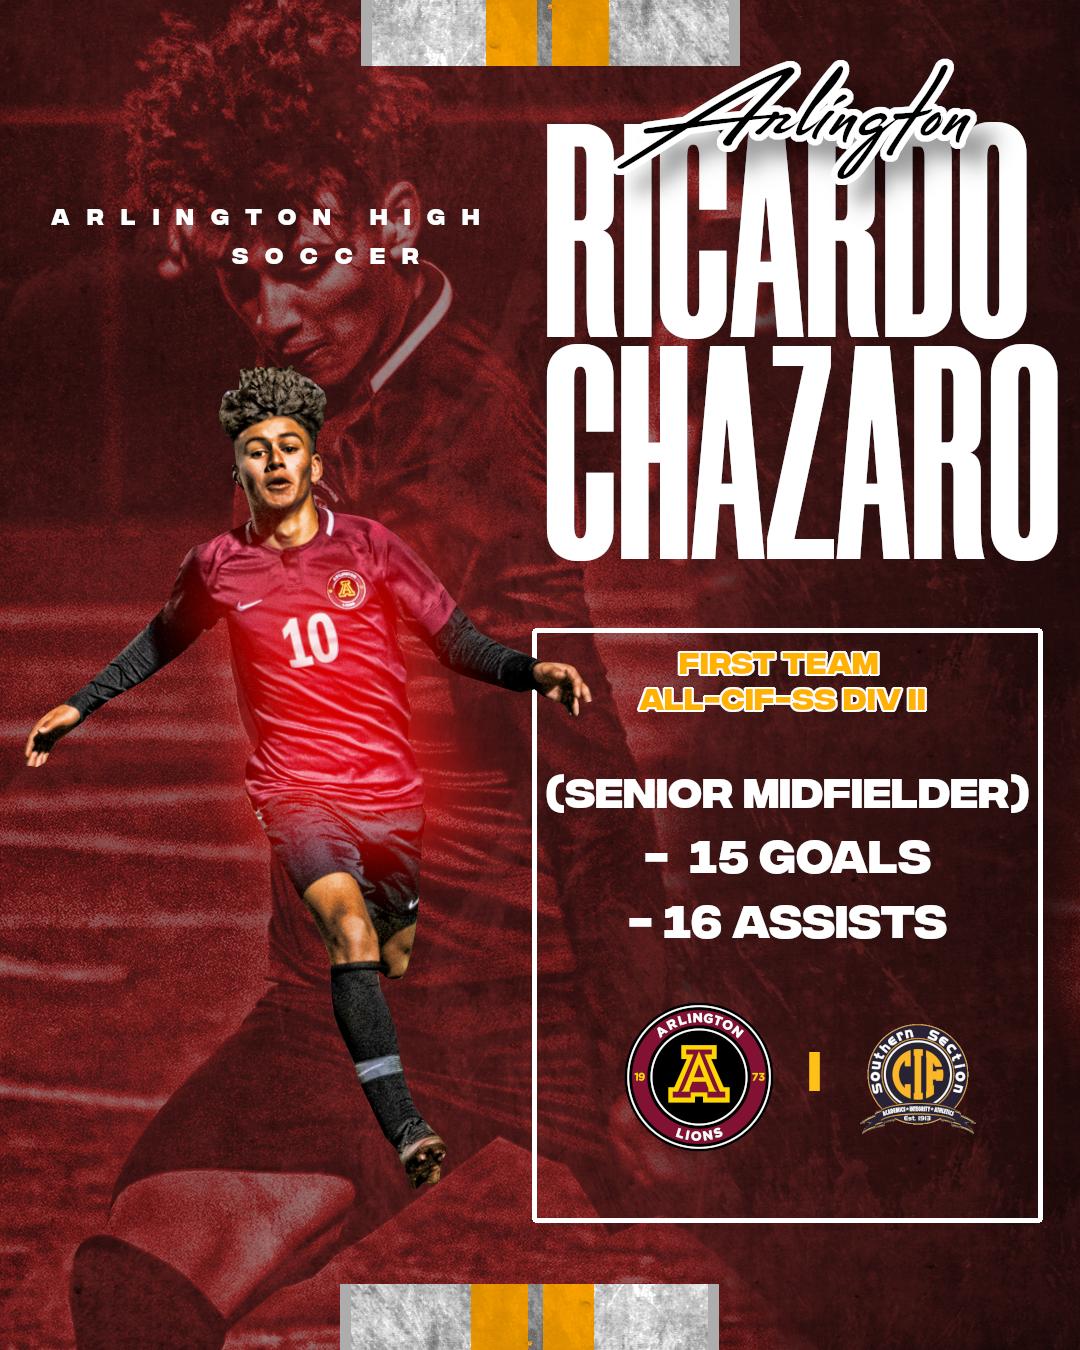 Ricardo Chazaro – First Team All-CIF-Div. II Boys Soccer